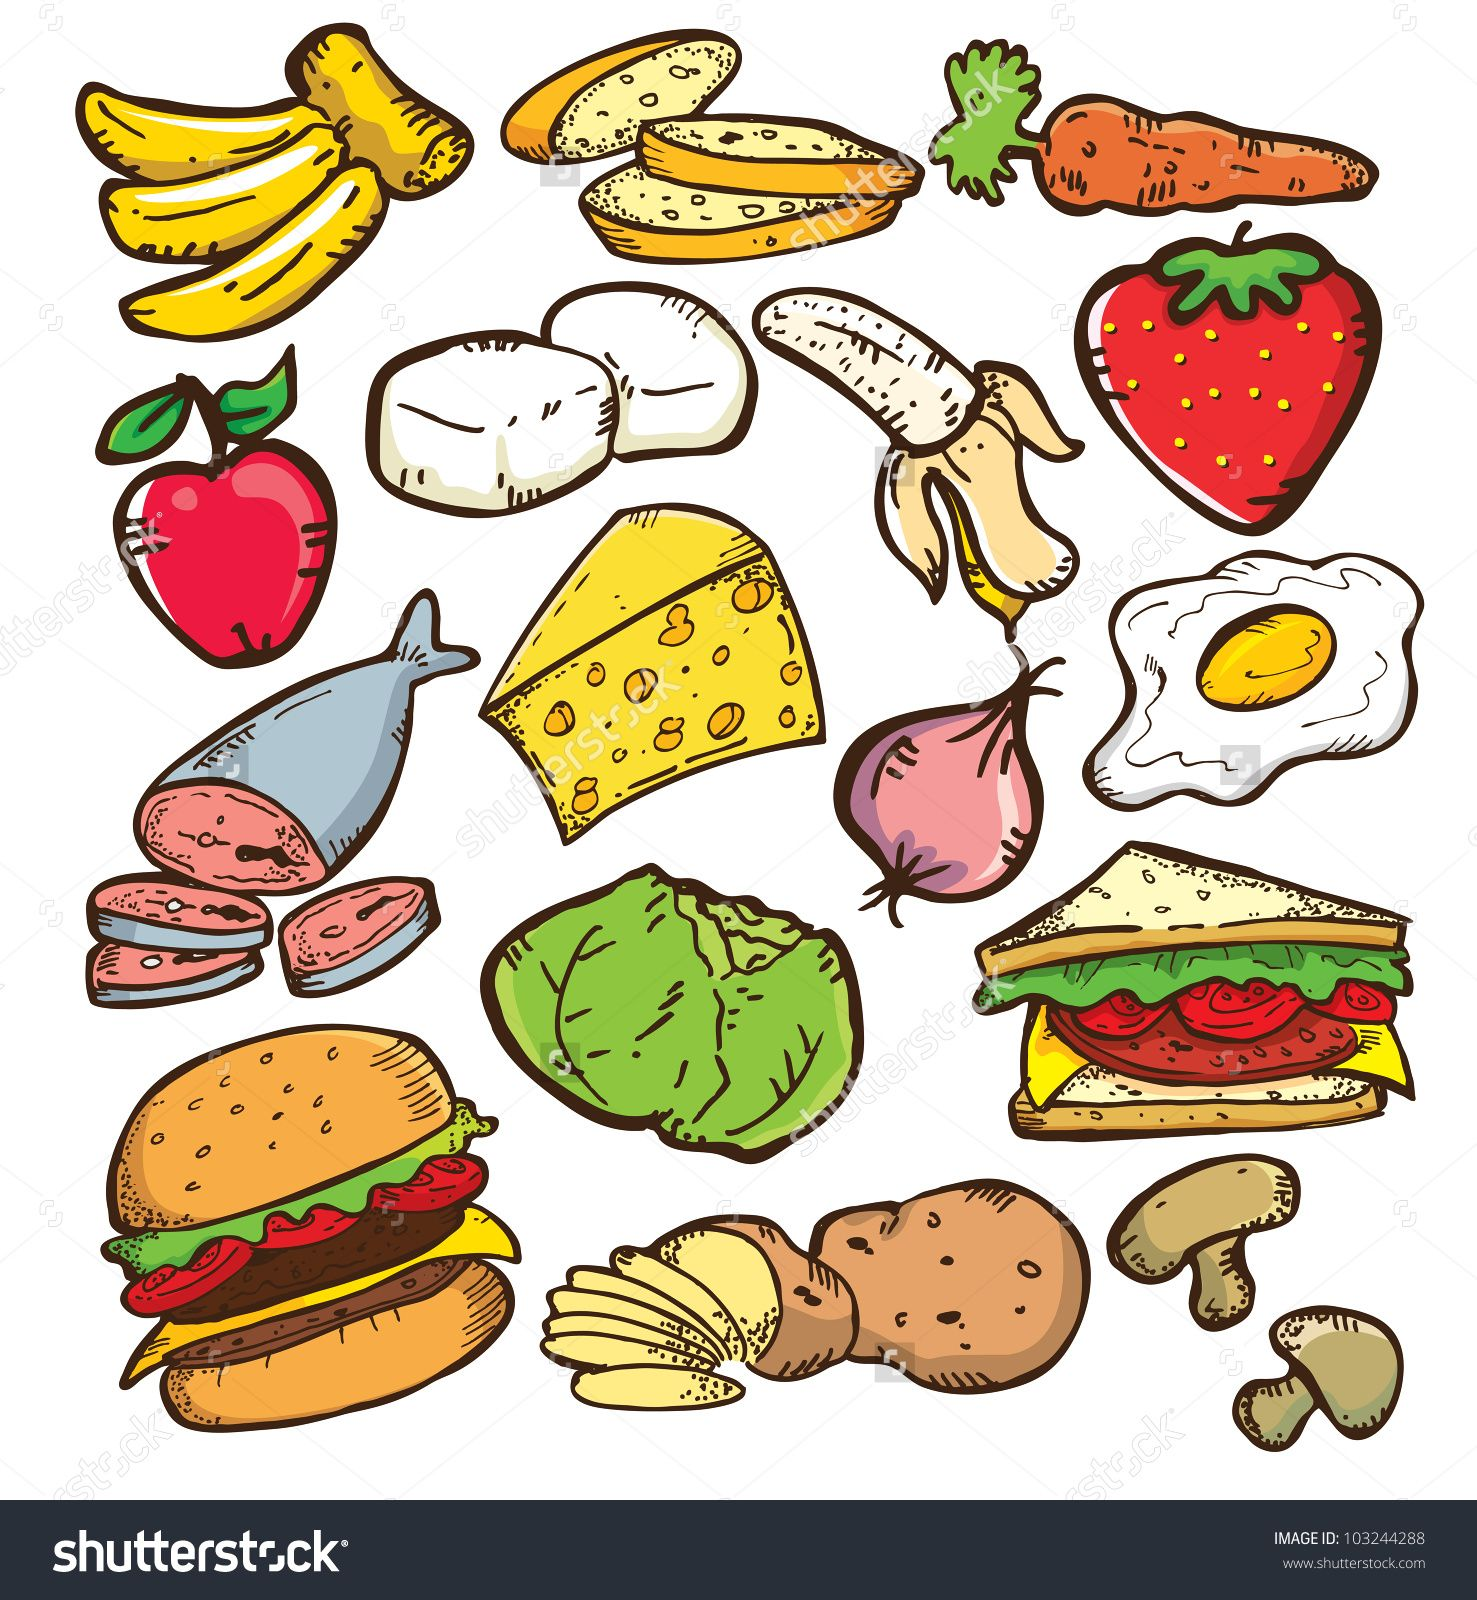 Healthy food clipart jpg library Pin by jasmi khayal on Painting Still life | Natural ... jpg library